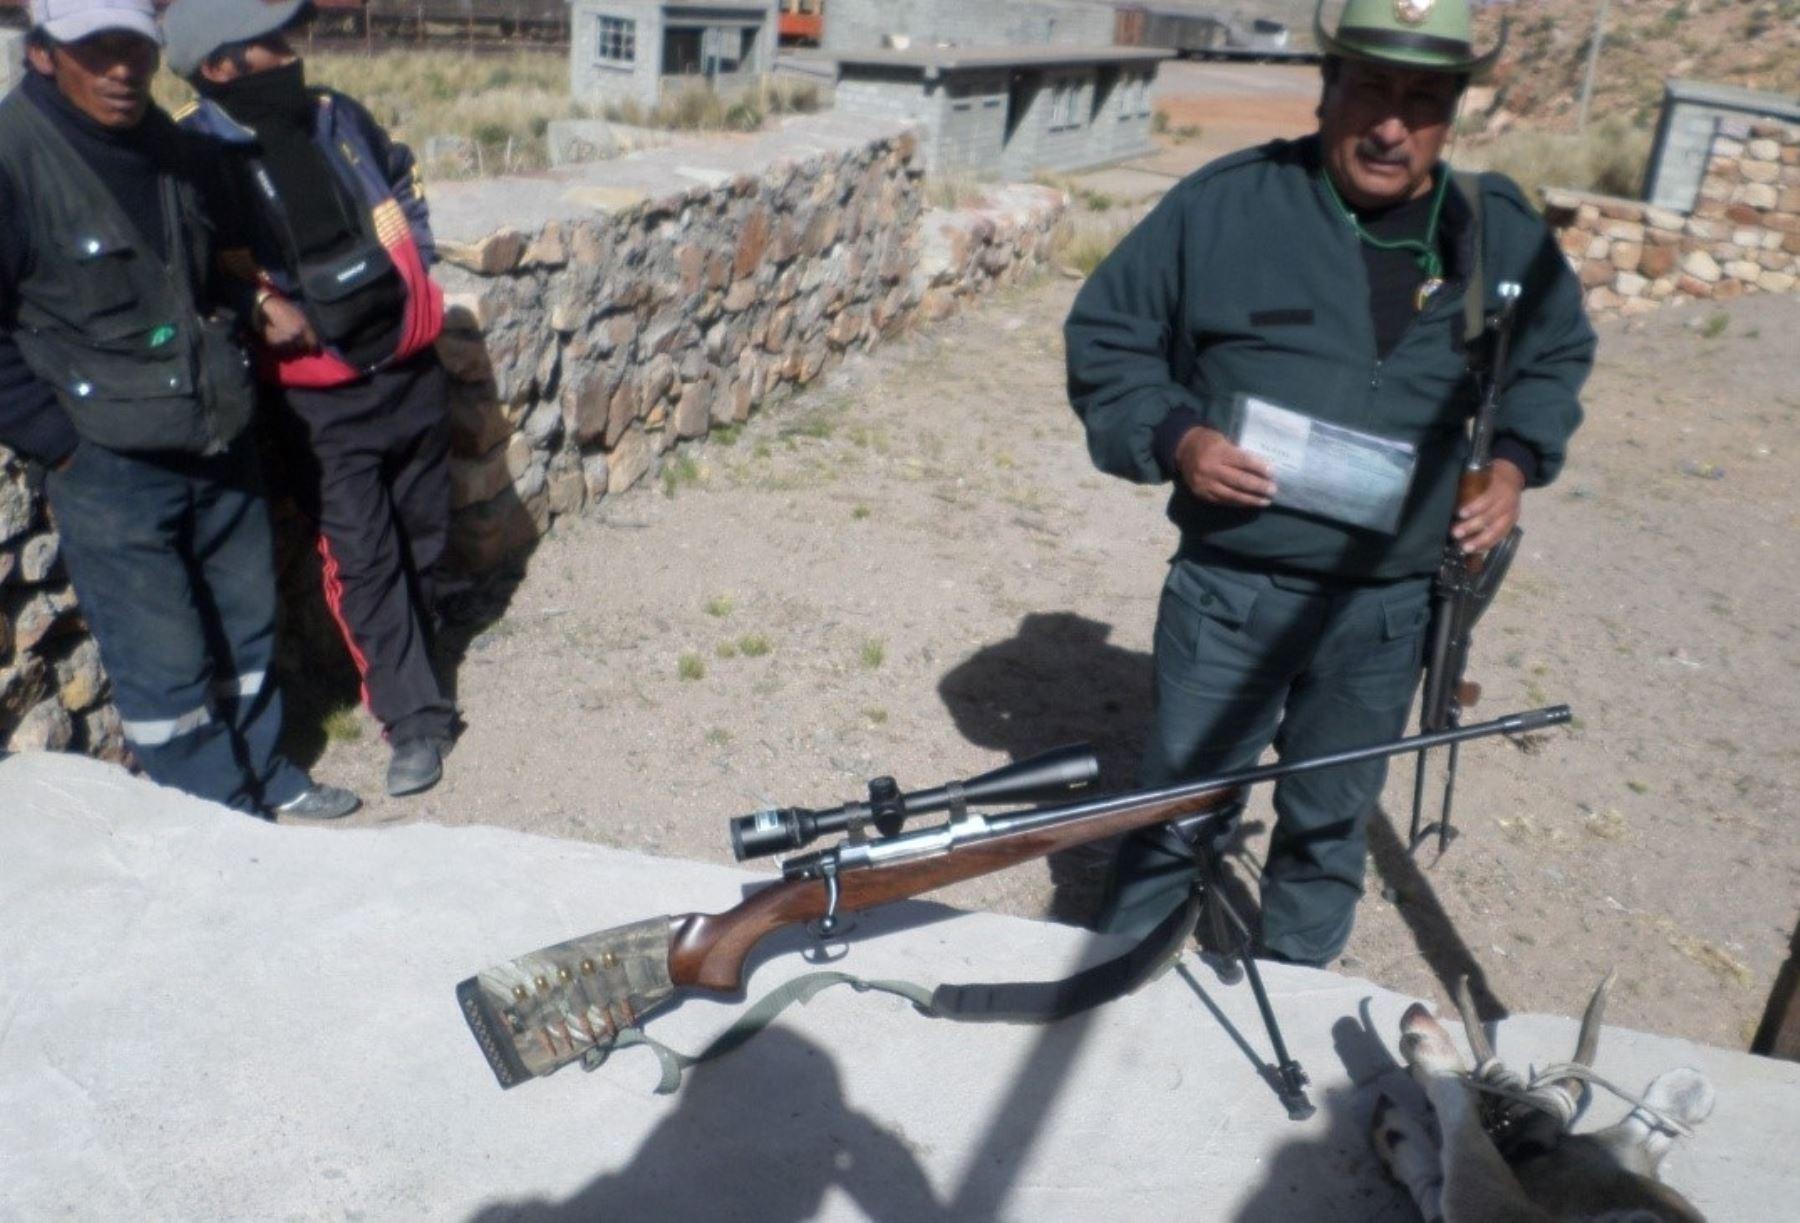 Capturan a presuntos cazadores furtivos en área natural protegida de Arequipa. ANDINA